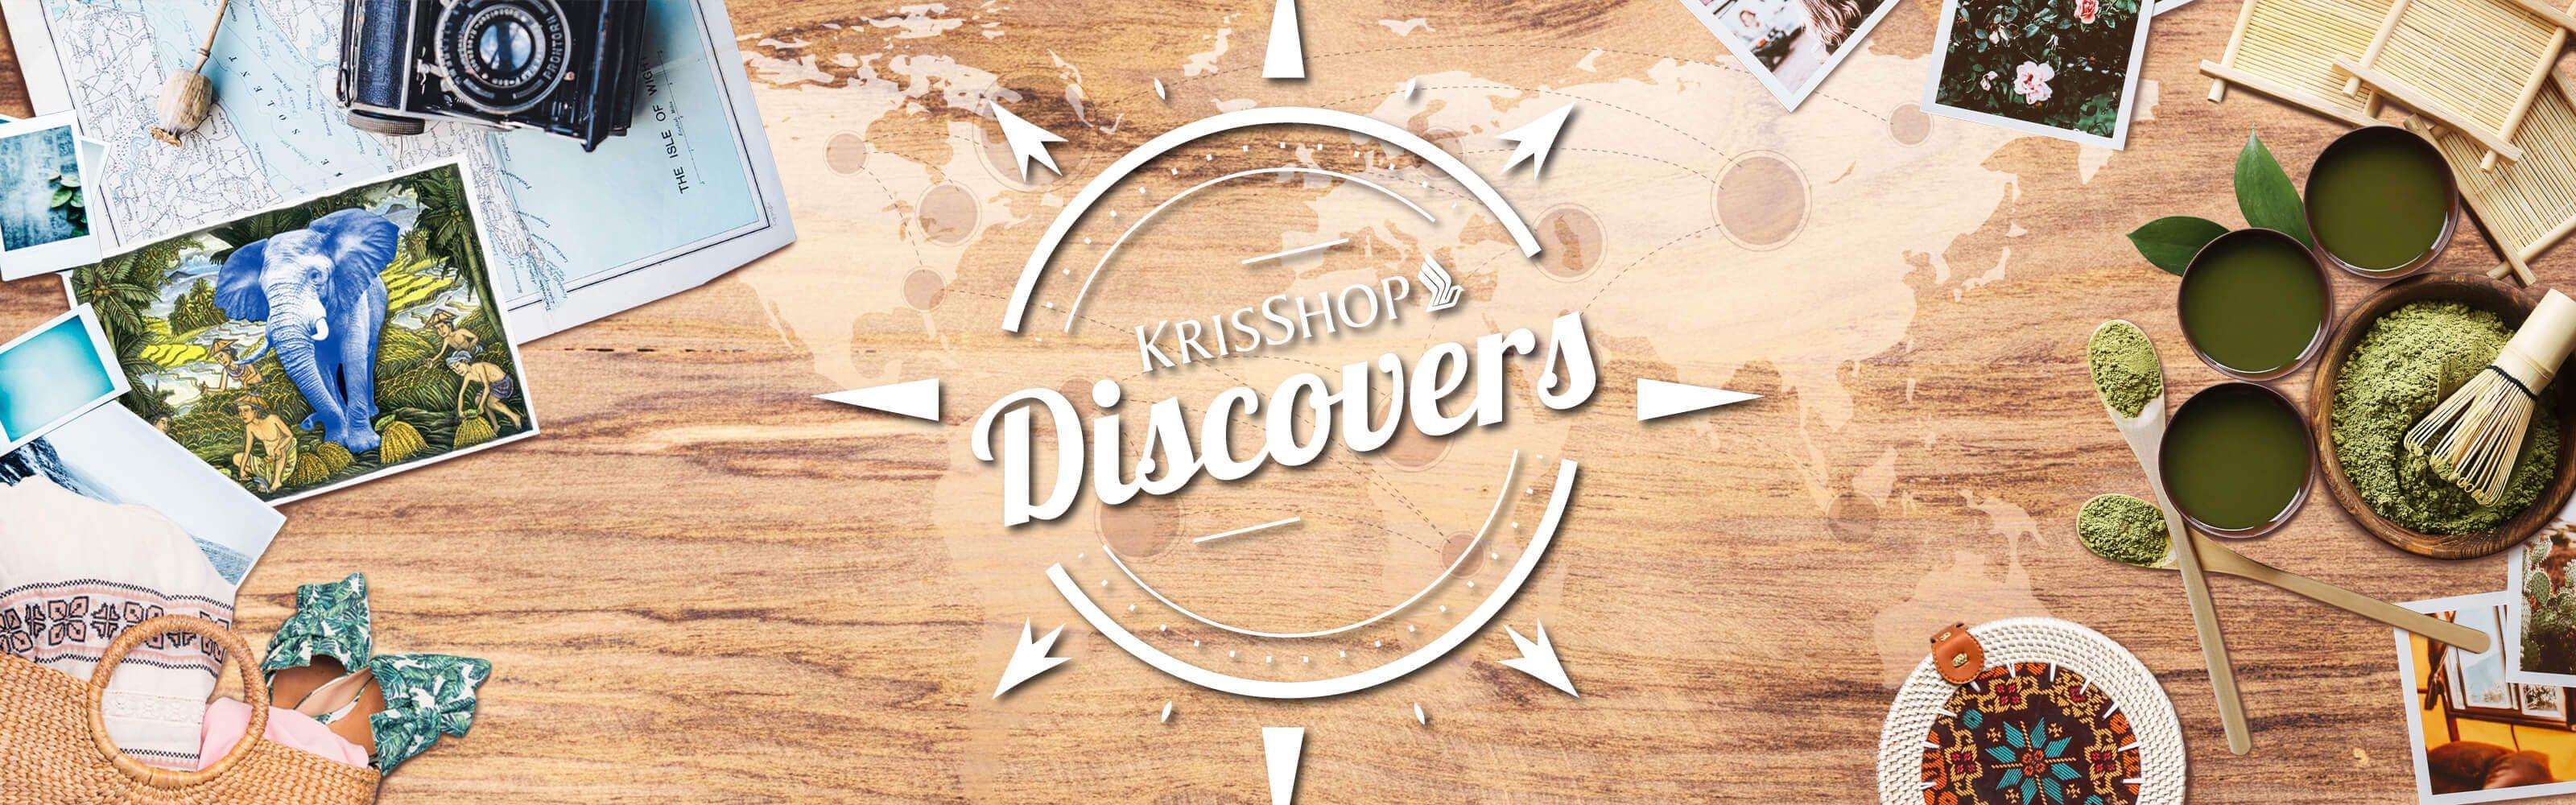 KrisShop Discovers